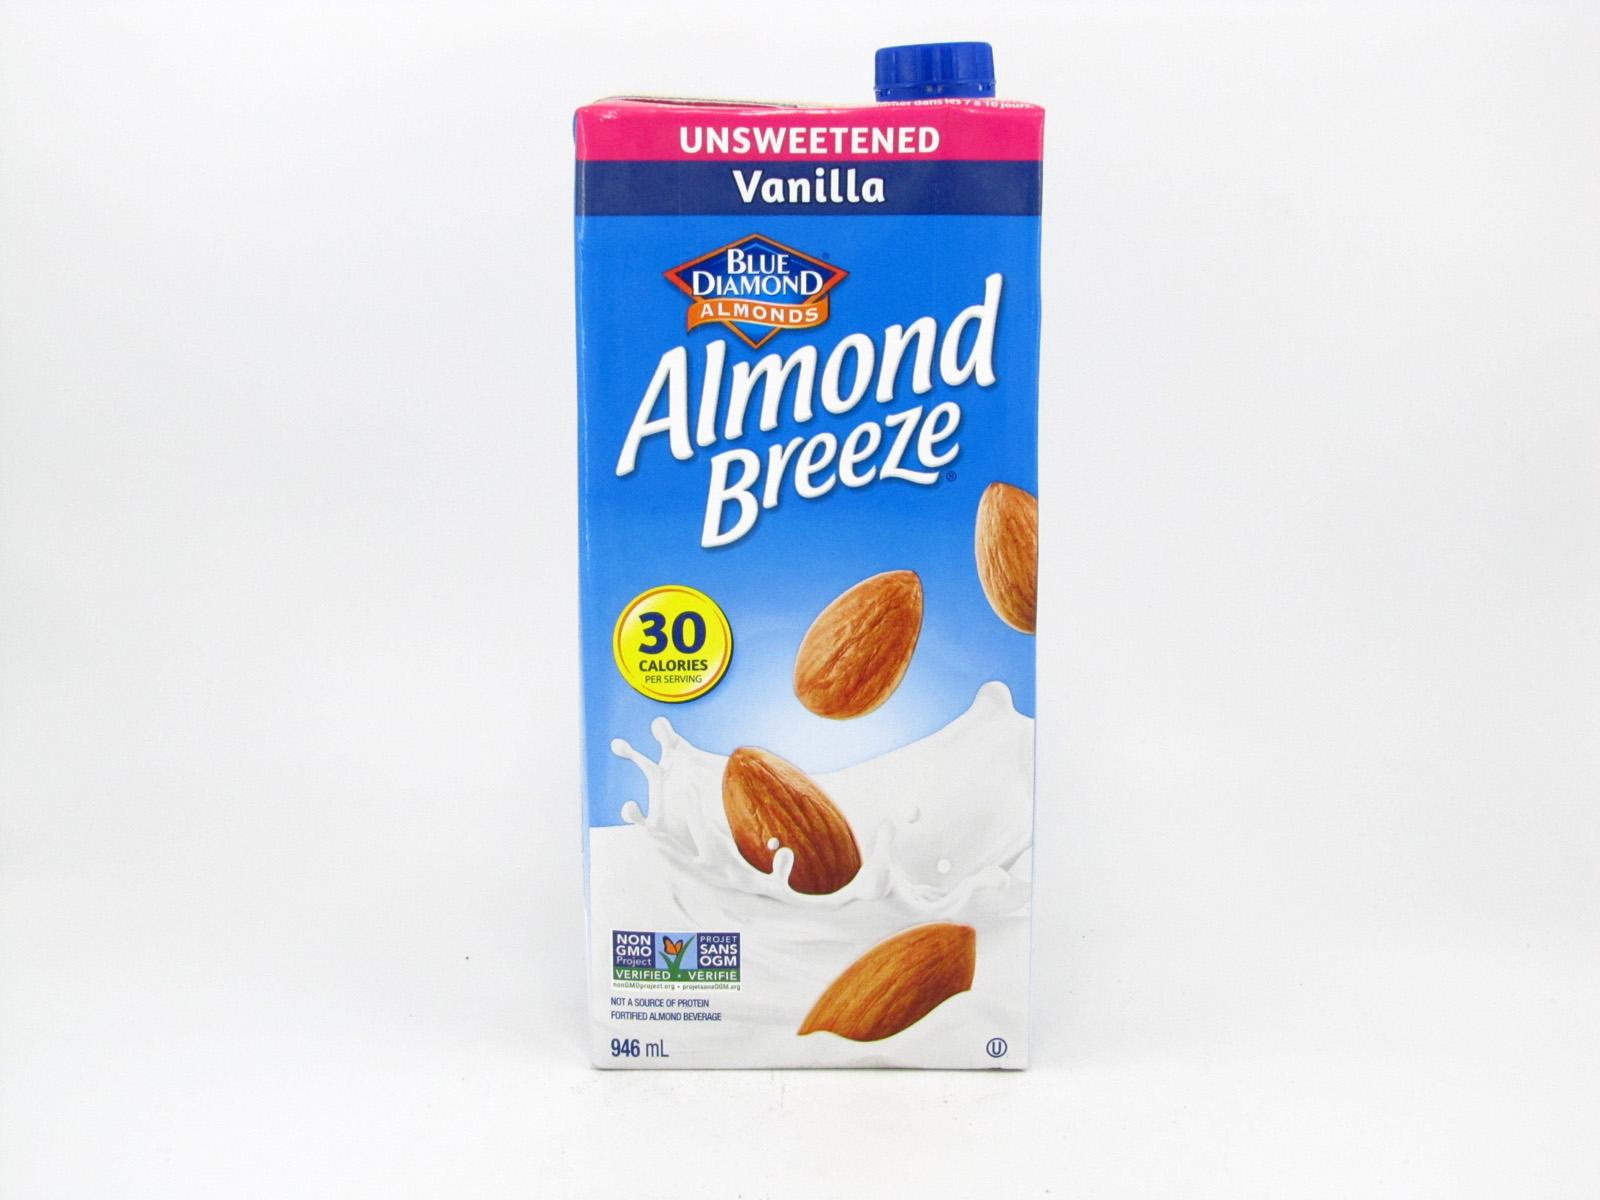 Almond Breeze - Vanilla - front view